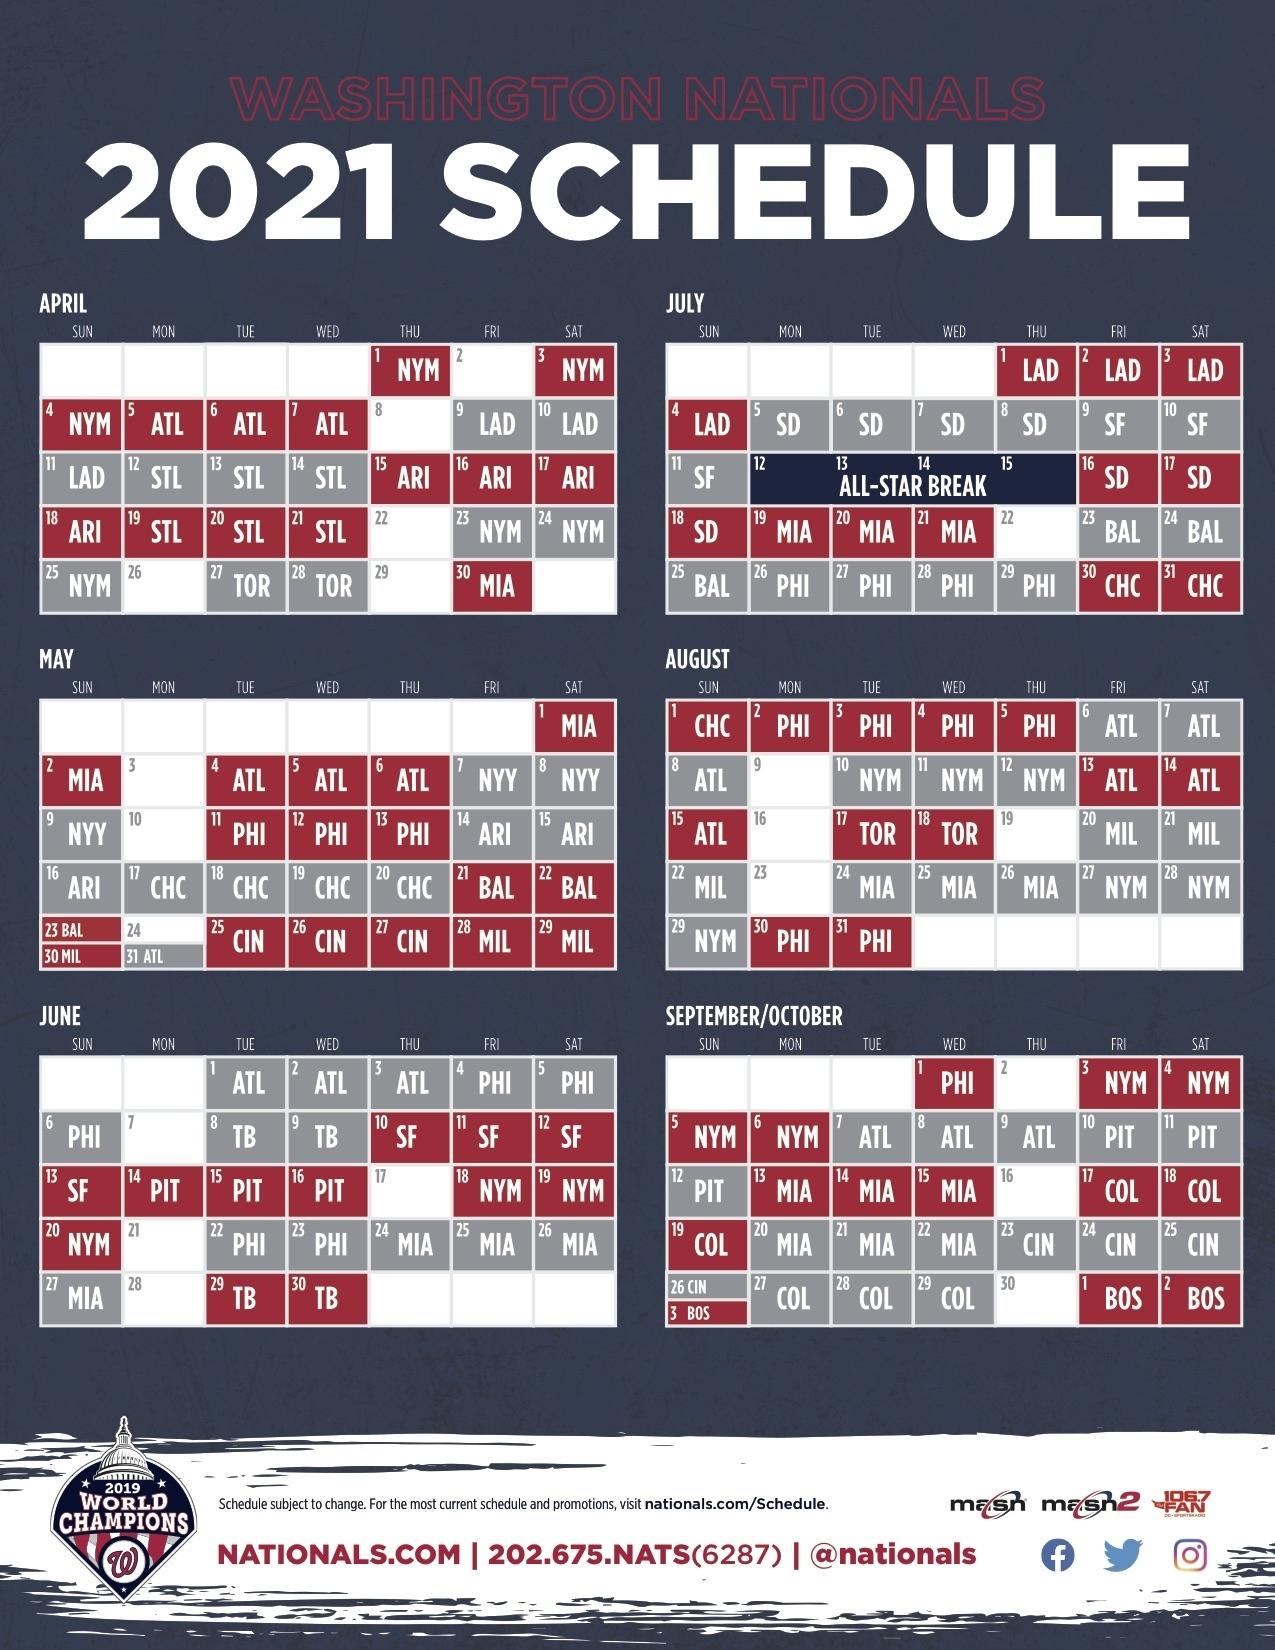 Nationals Announce 2021 Schedule - Masn News & Information Atlanta Braves Printable Schedule Calendar 2021